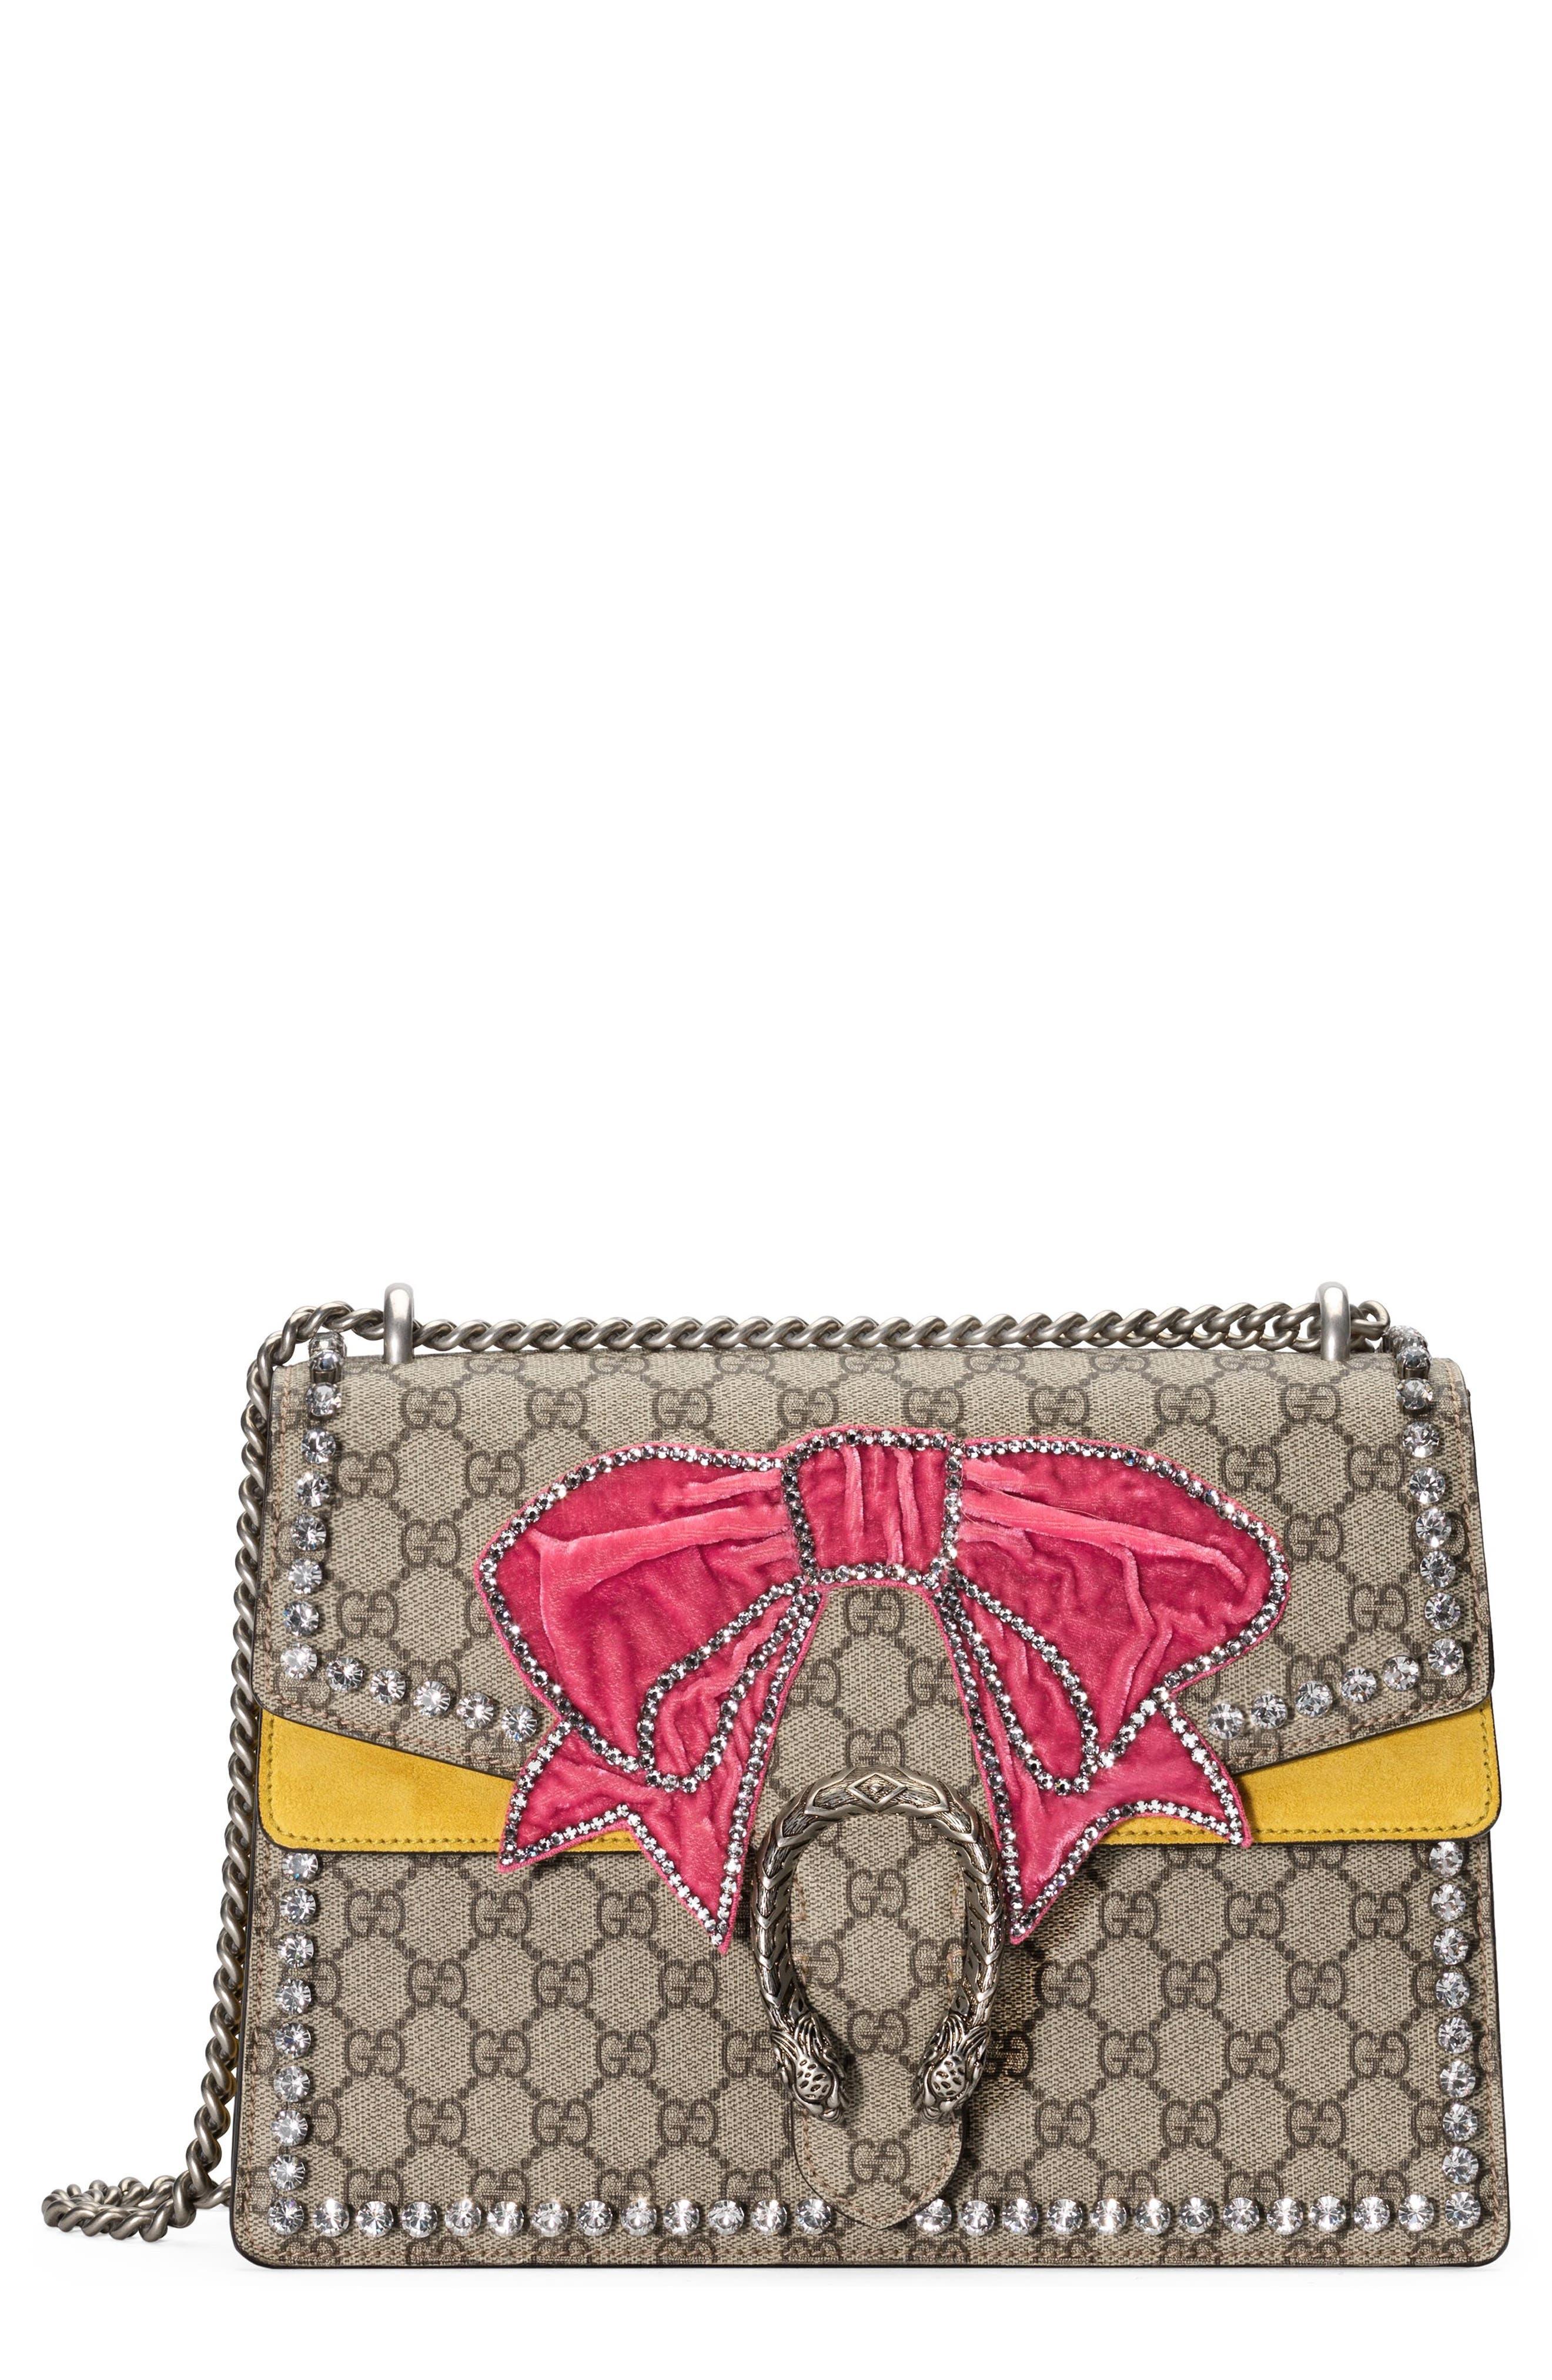 Medium Dionysus GG Supreme Canvas Shoulder Bag,                             Main thumbnail 1, color,                             250